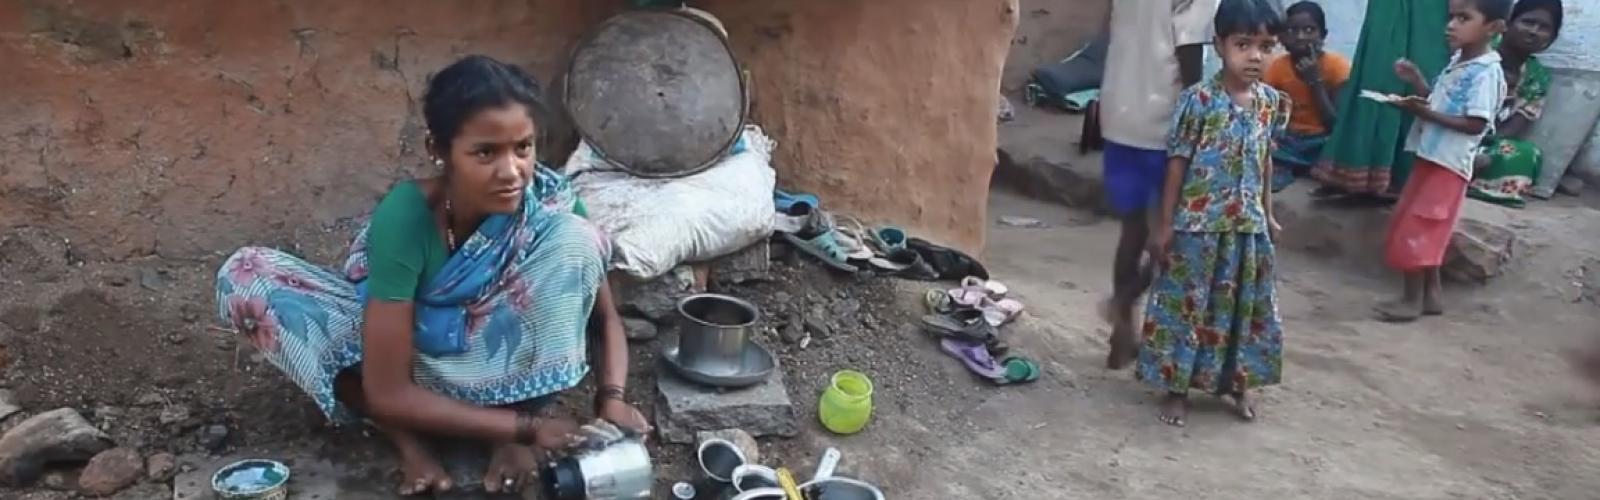 Verhaal Lakshmi India